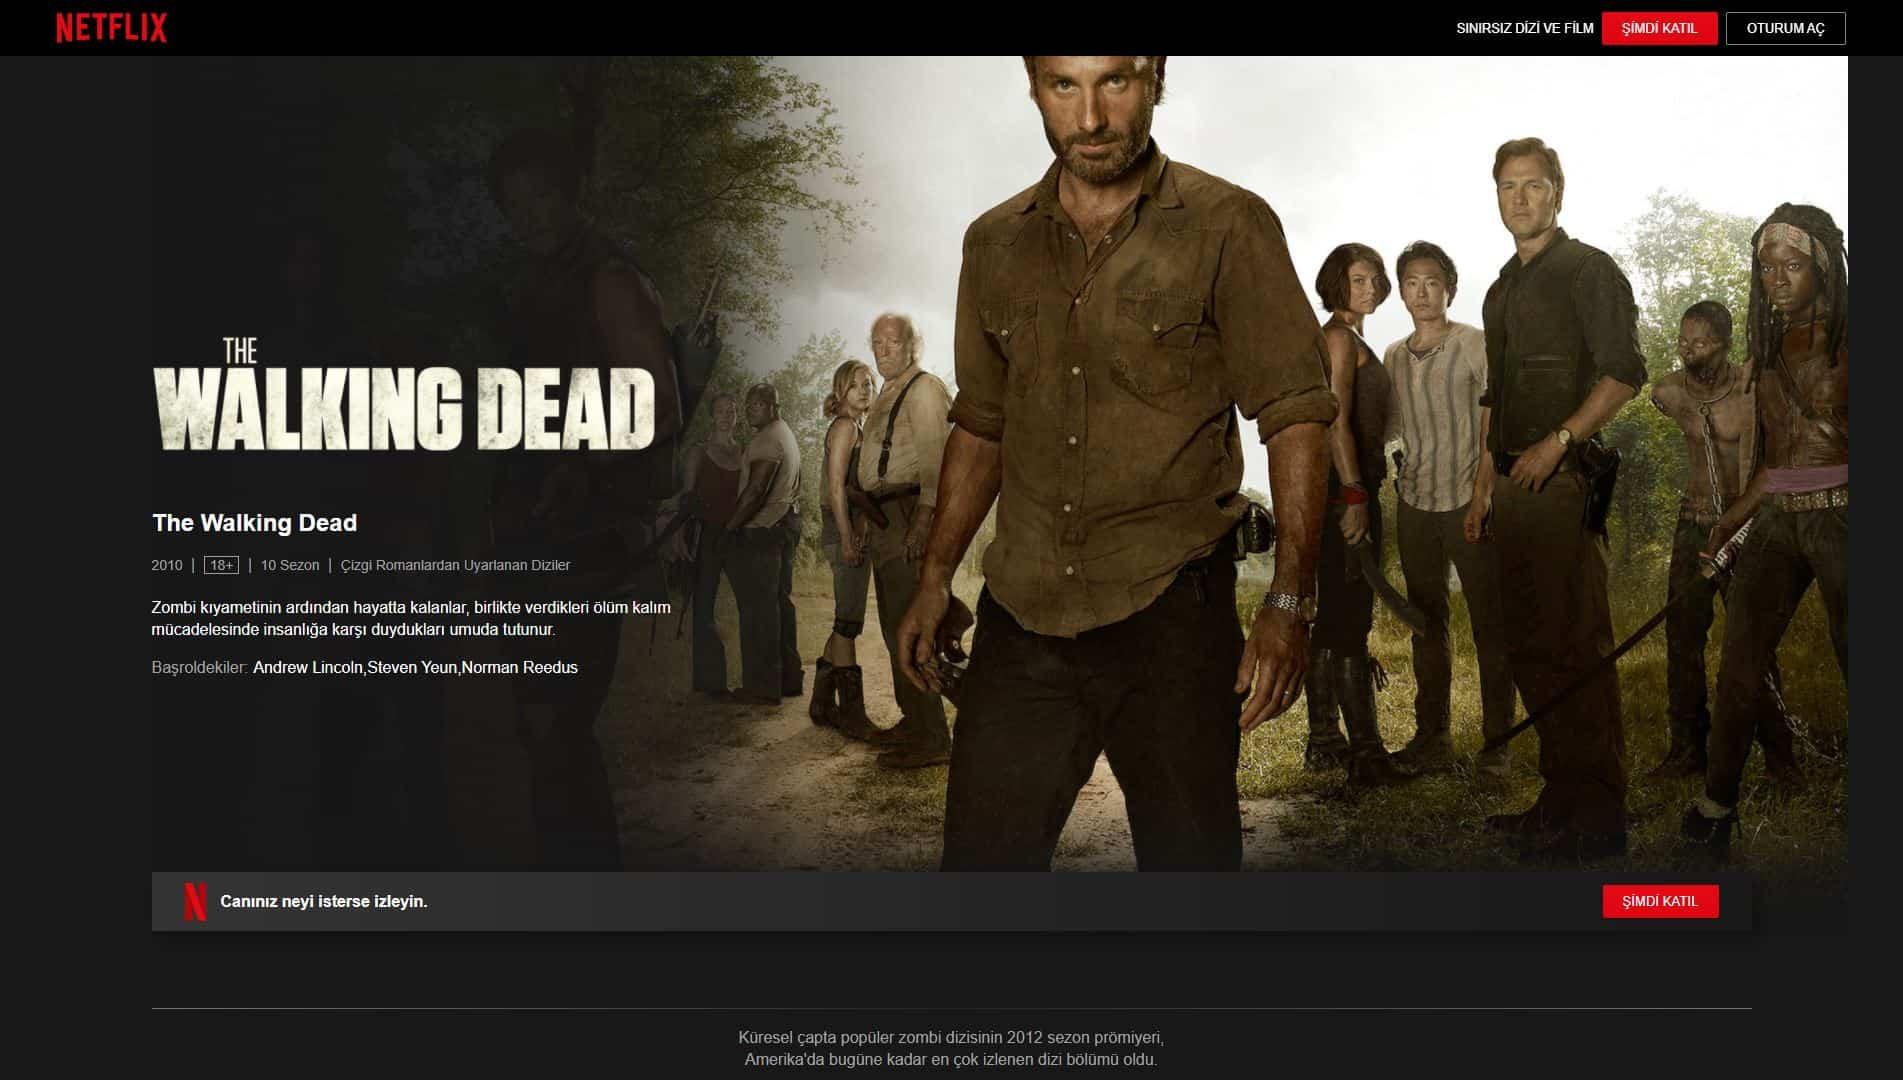 The Walking Dead Nereden izlenir